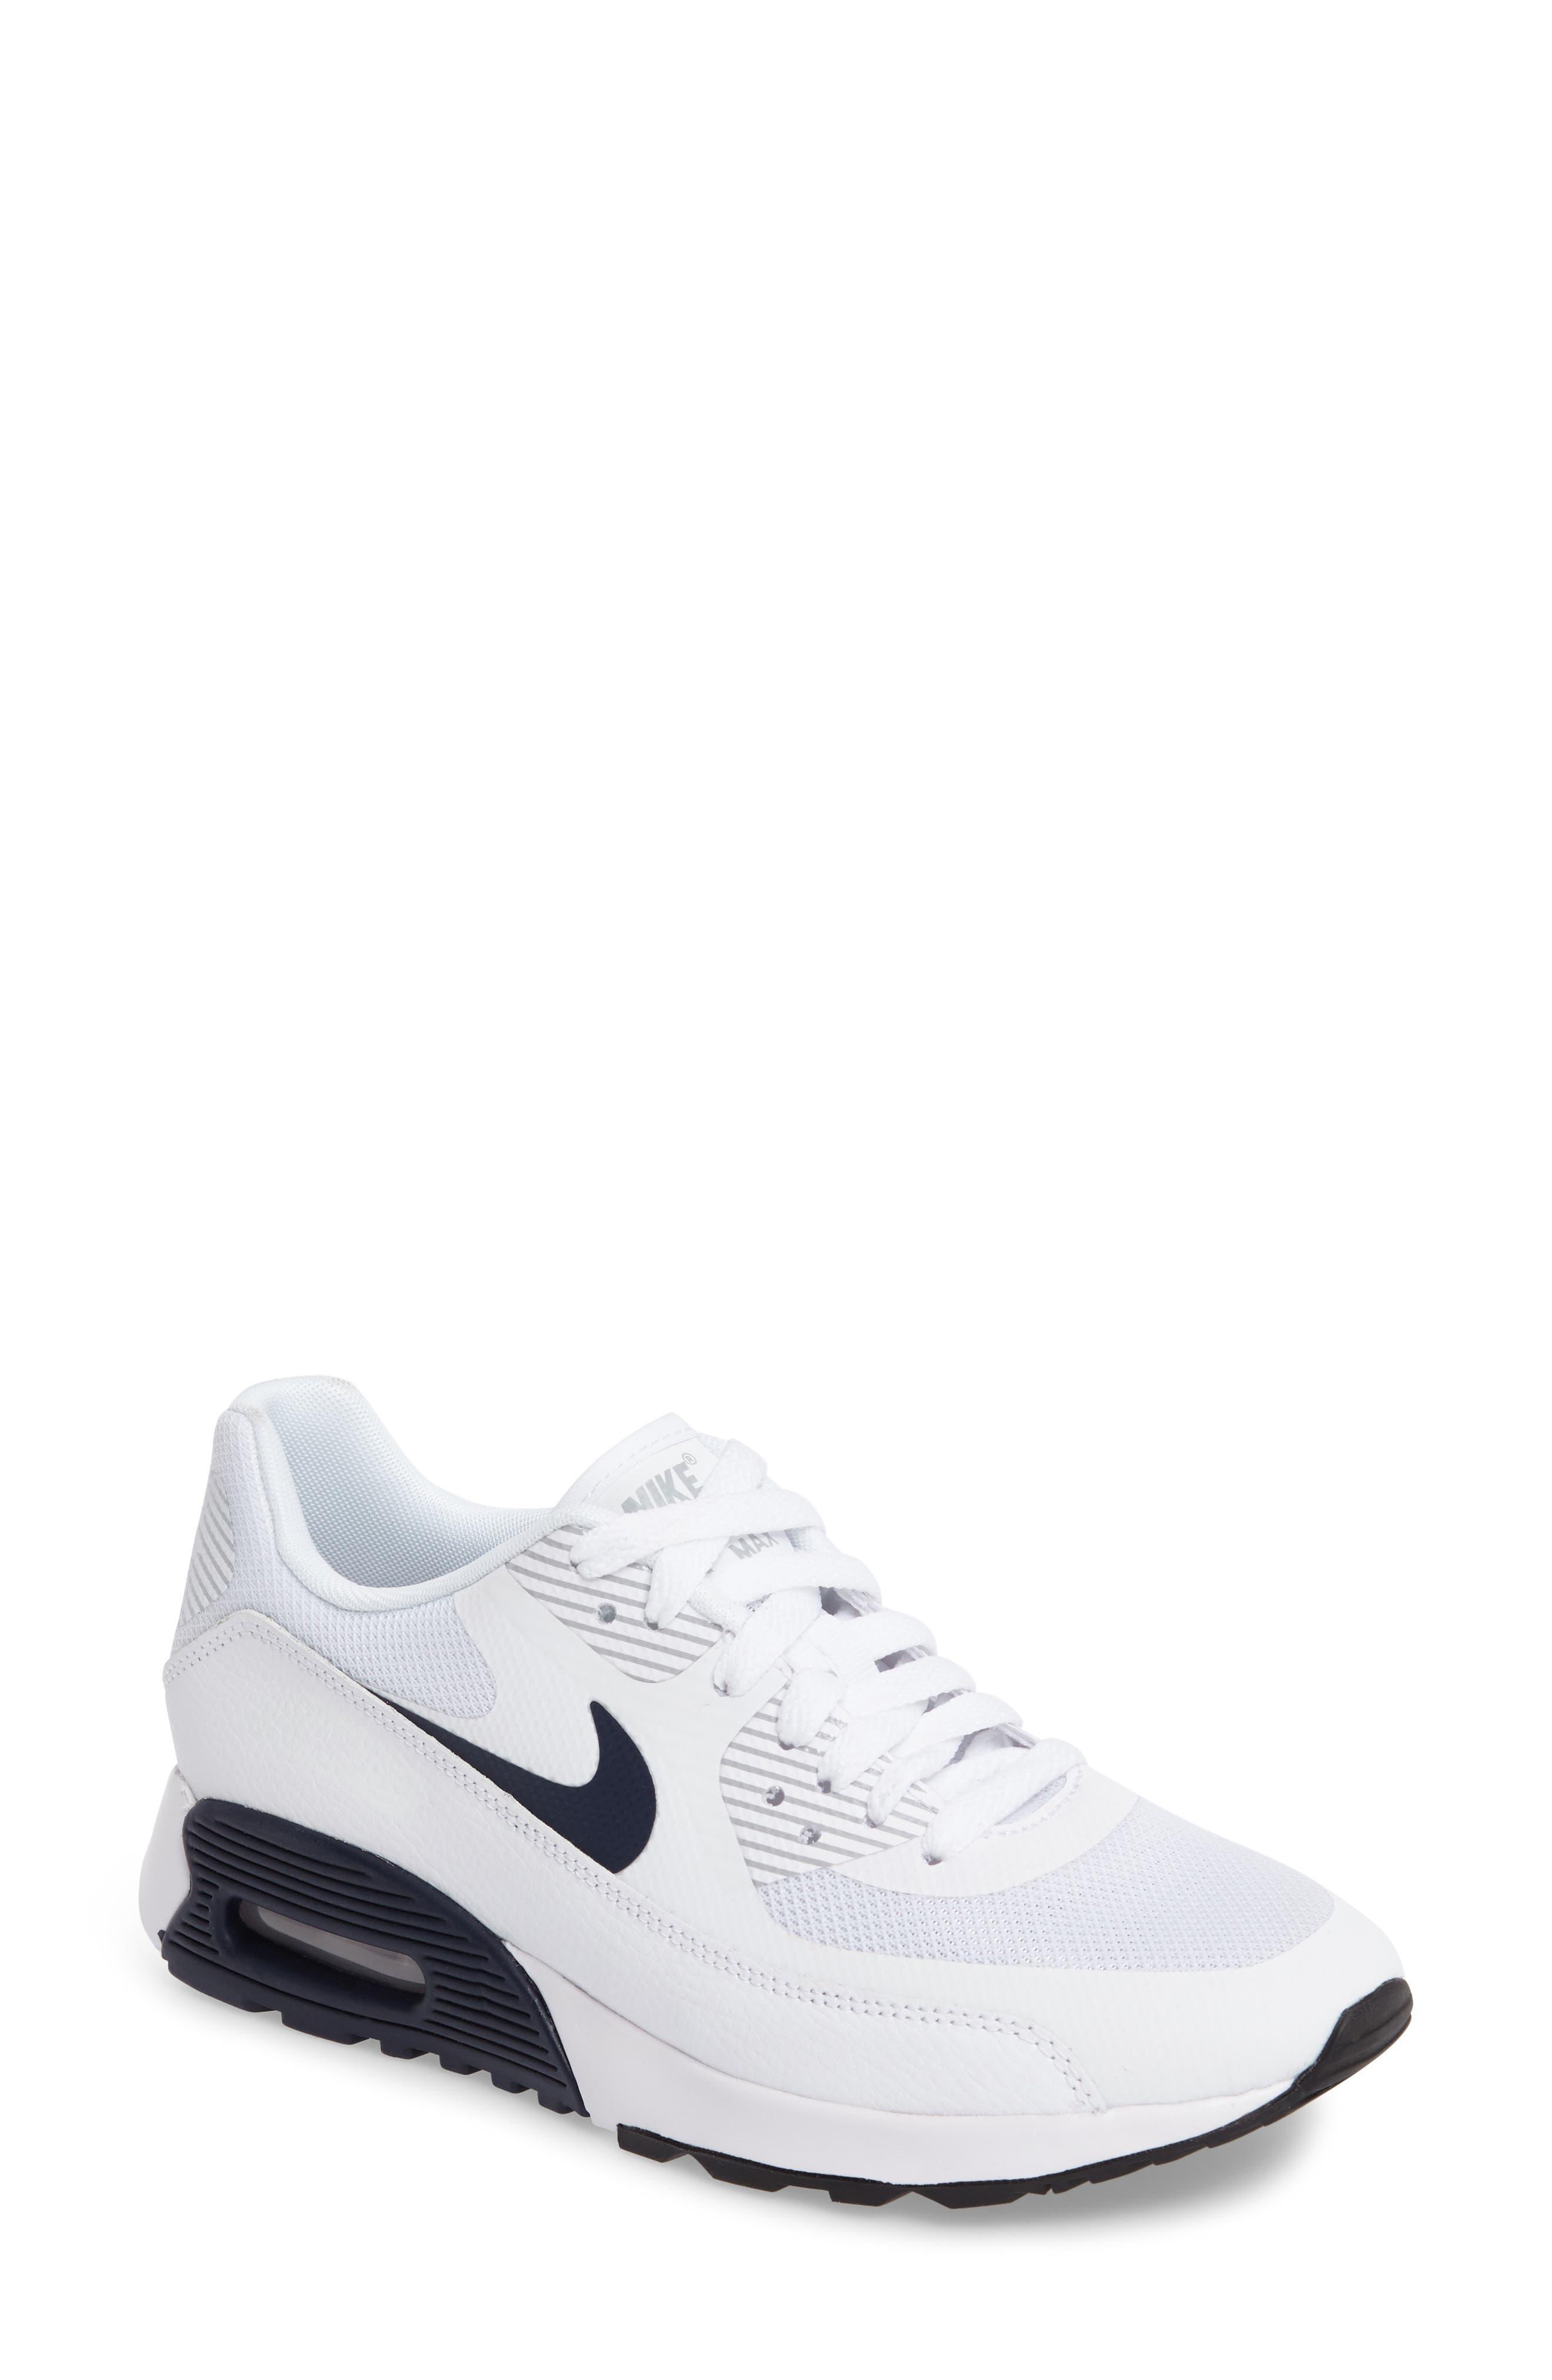 Air Max 90 Ultra 2.0 Sneaker,                             Main thumbnail 1, color,                             White/ Navy/ Wolf Grey/ Black